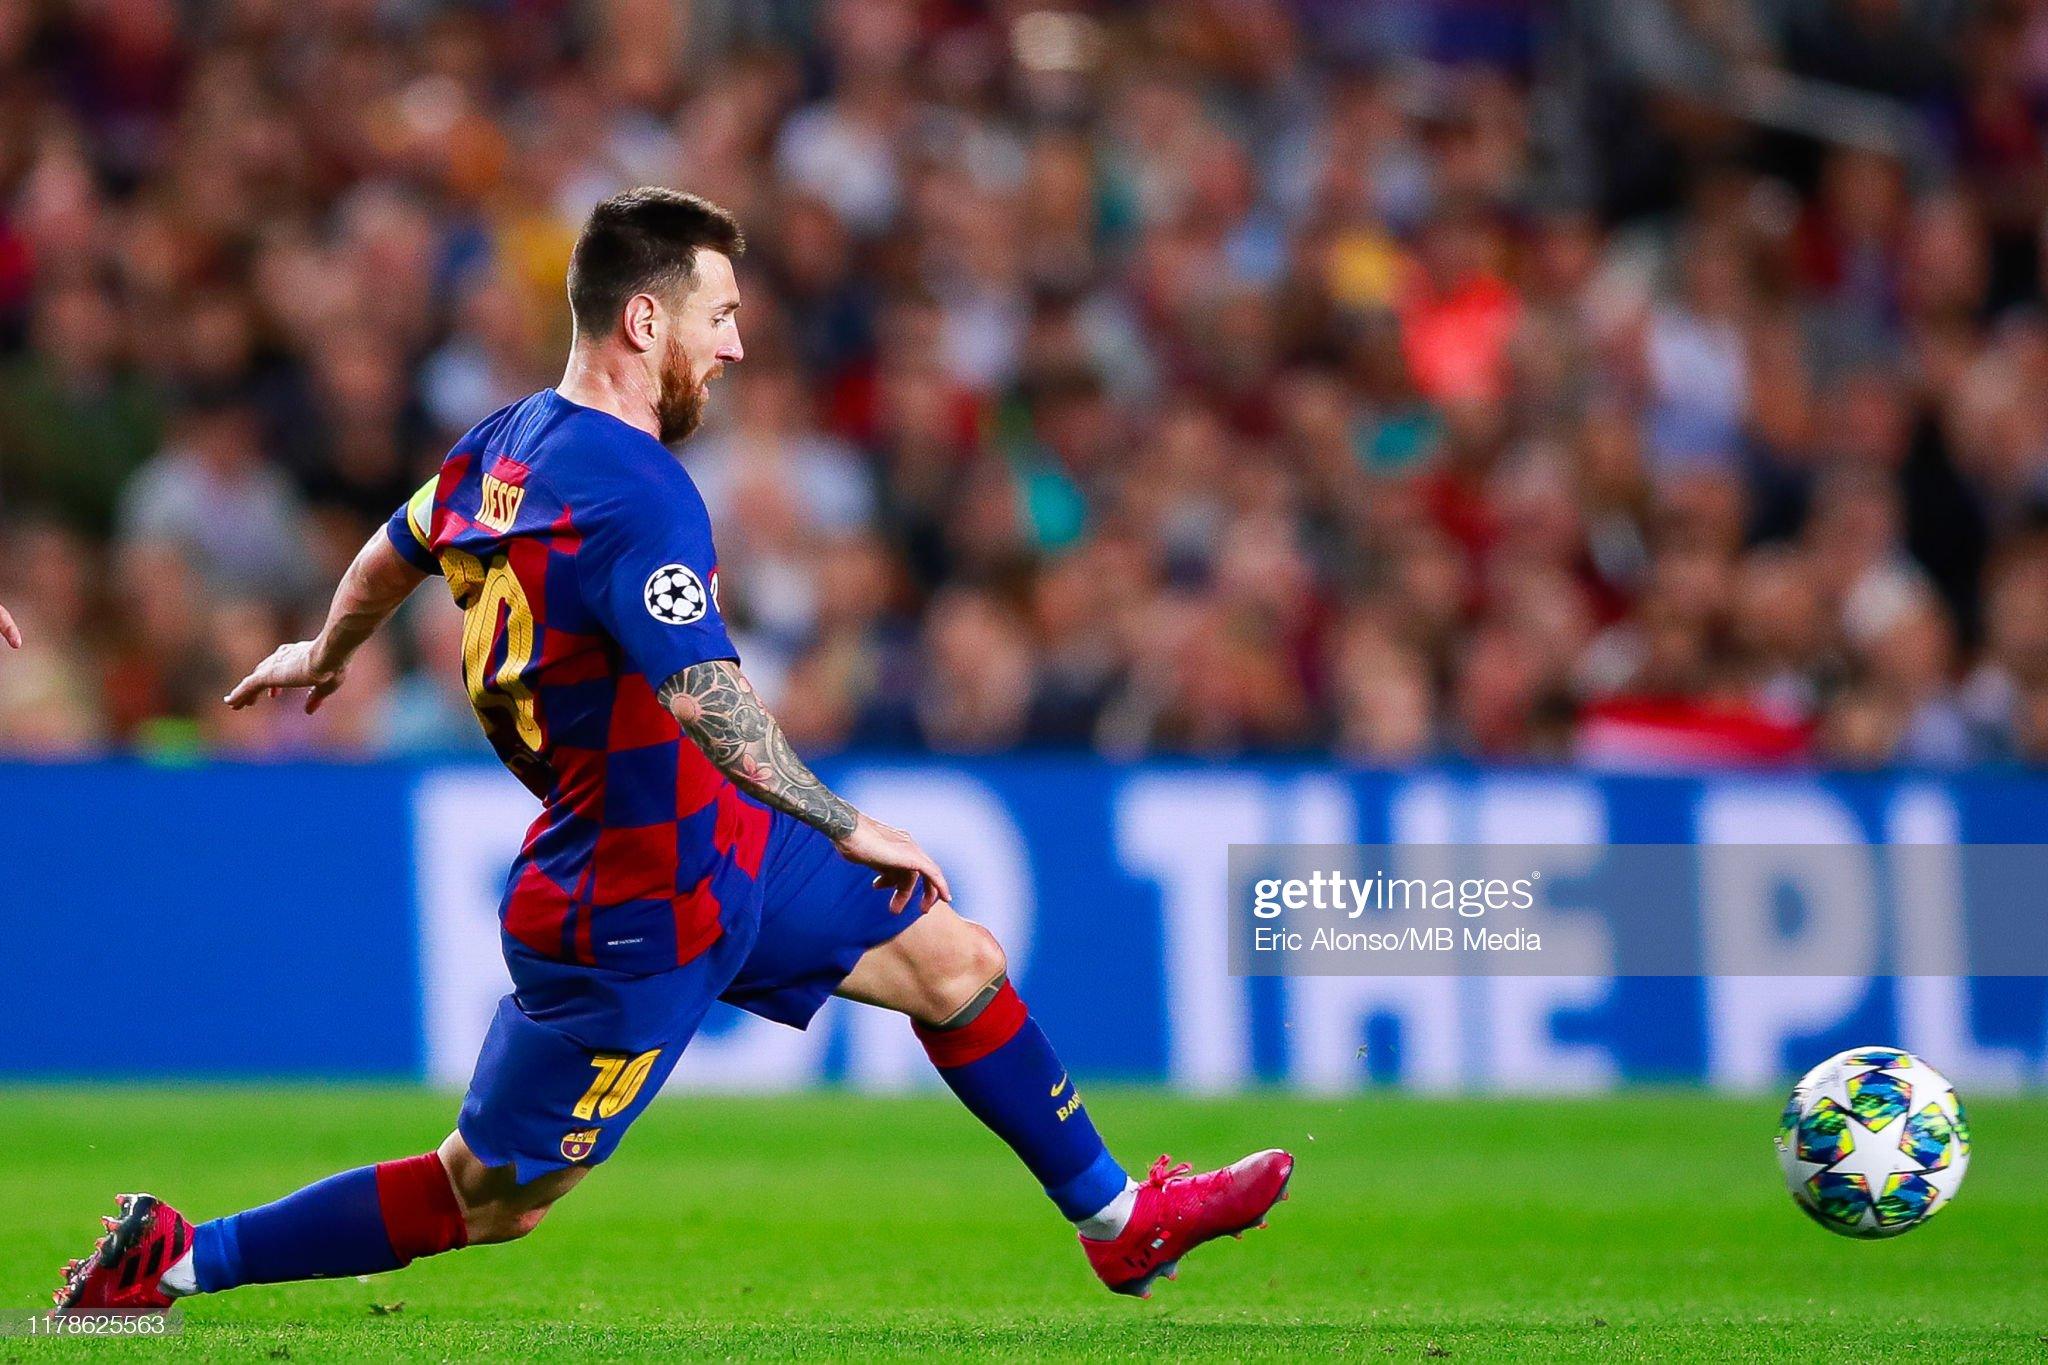 صور مباراة : برشلونة - إنتر 2-1 ( 02-10-2019 )  Lionel-messi-of-fc-barcelona-passes-the-ball-during-the-uefa-league-picture-id1178625563?s=2048x2048